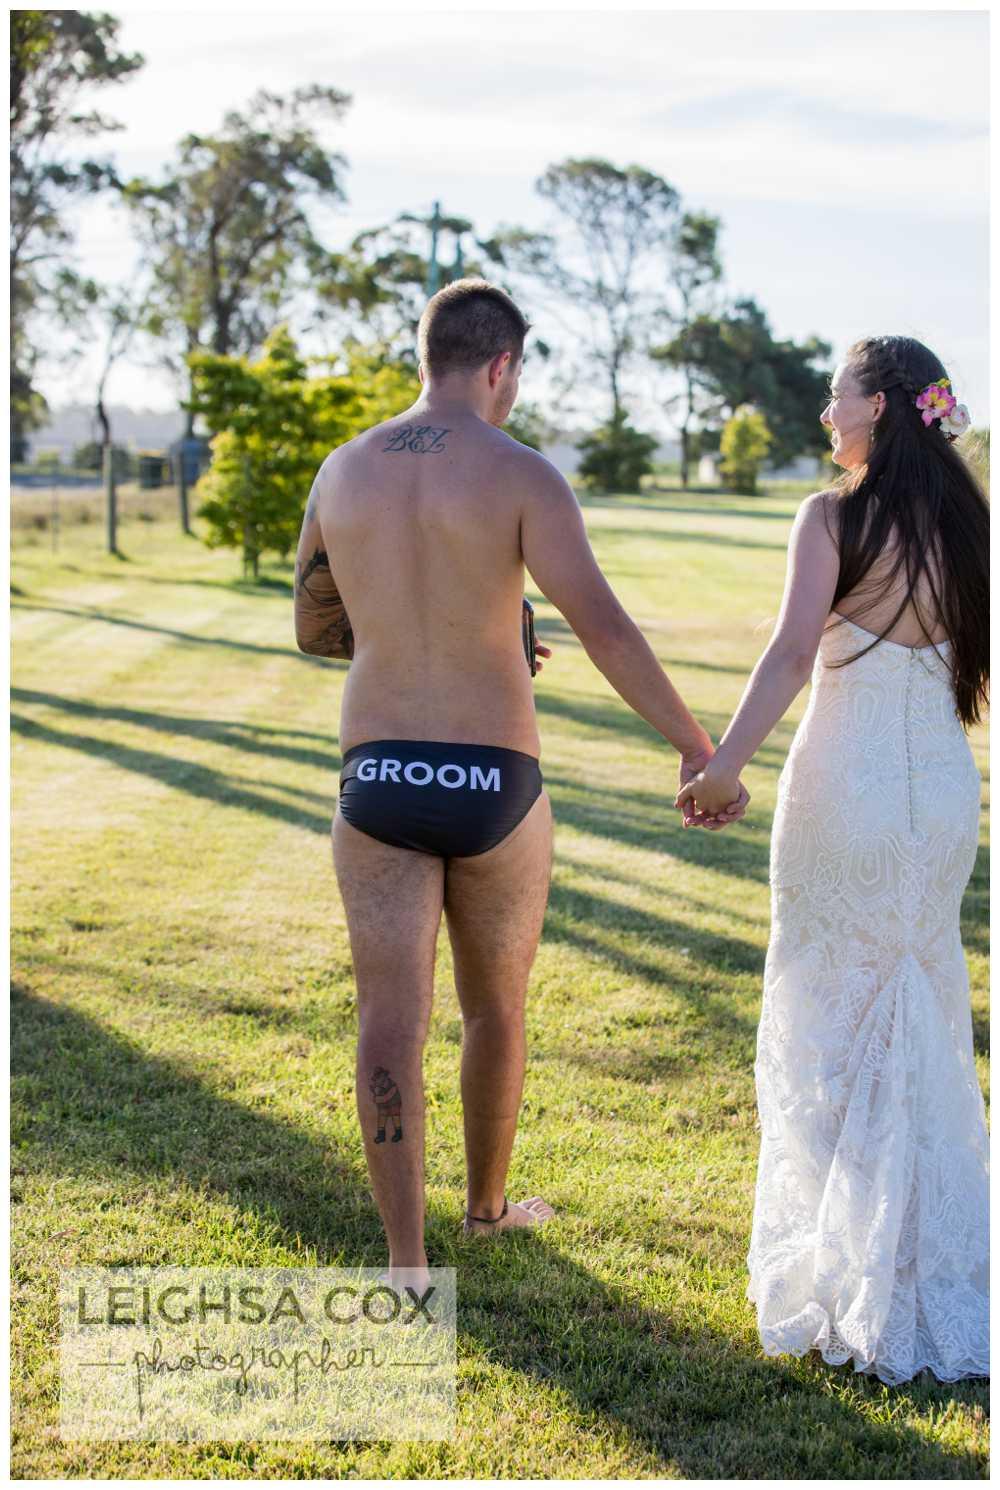 groom's butt